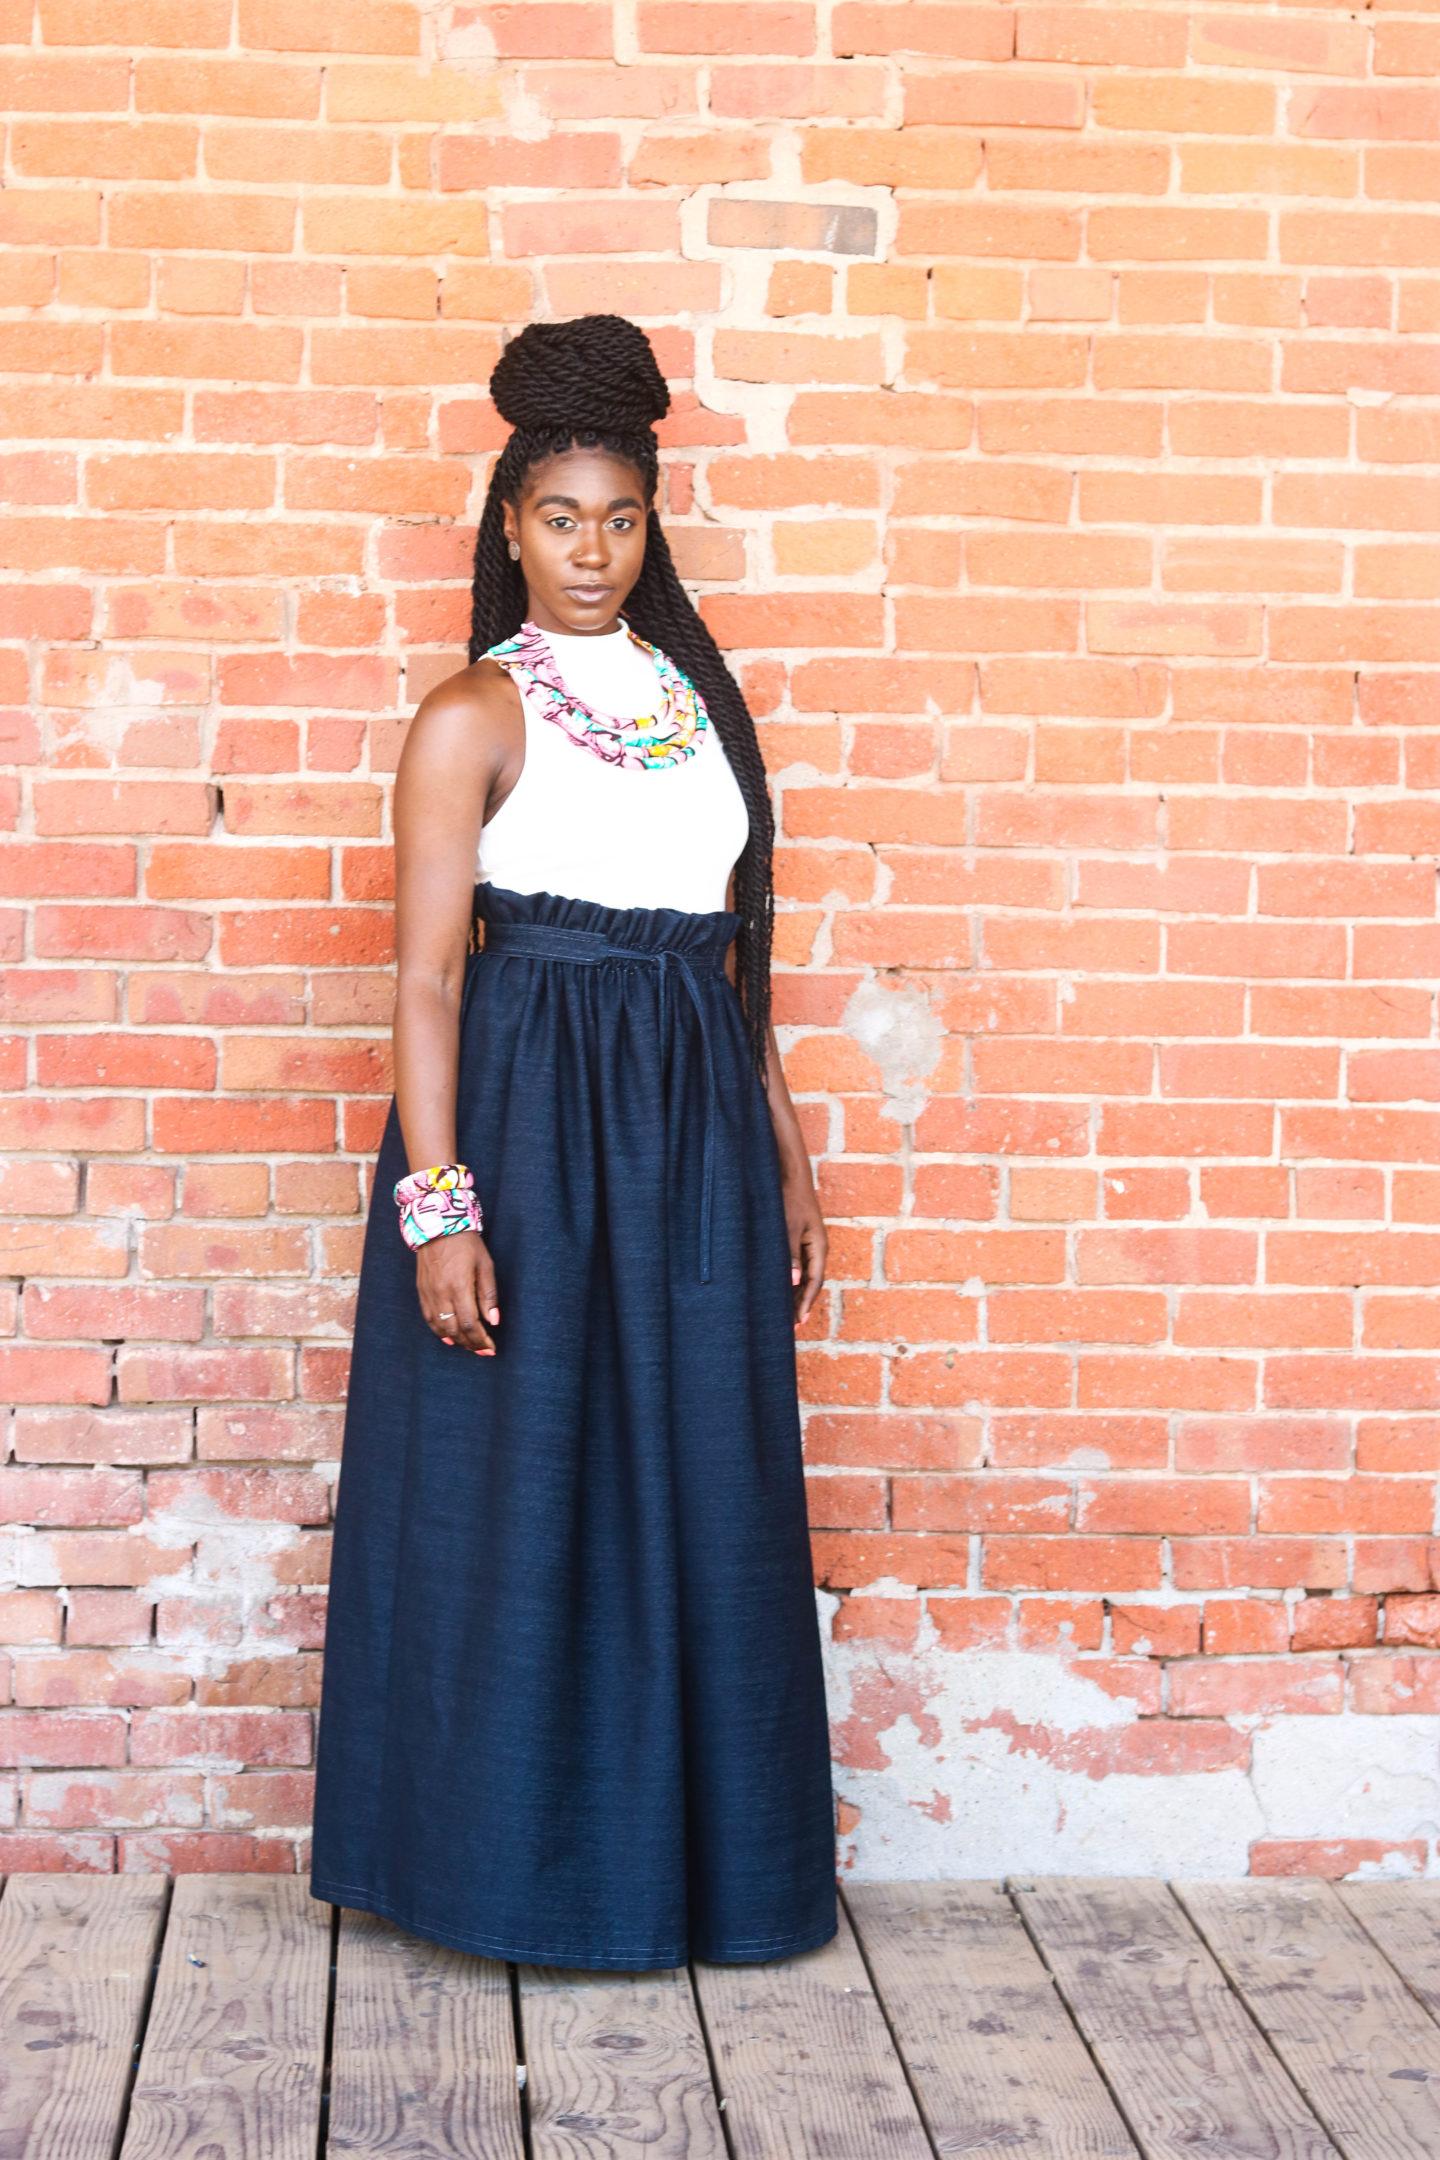 dd7021ecf6 Denim Skirt, Paperbag Skirt, DIY Paperbag Maxi Skirt, Maxi Skirt, Denim  Maxi ...